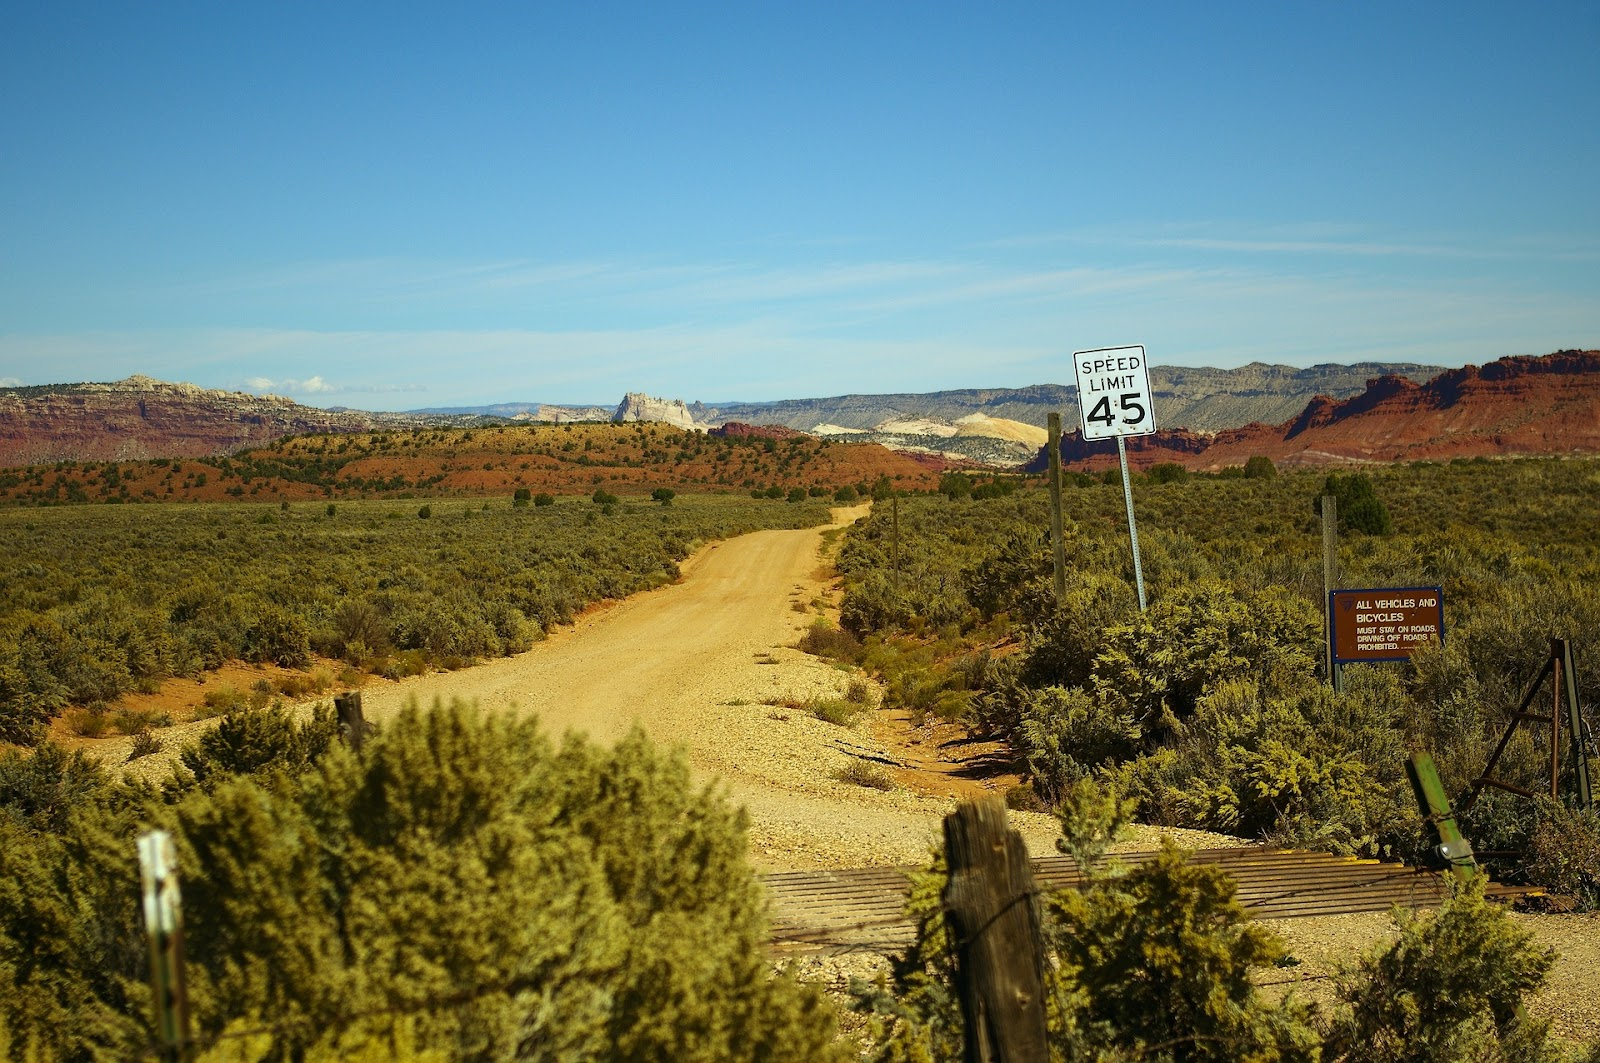 escalante-rural-trail-fields-red-rocks-utah